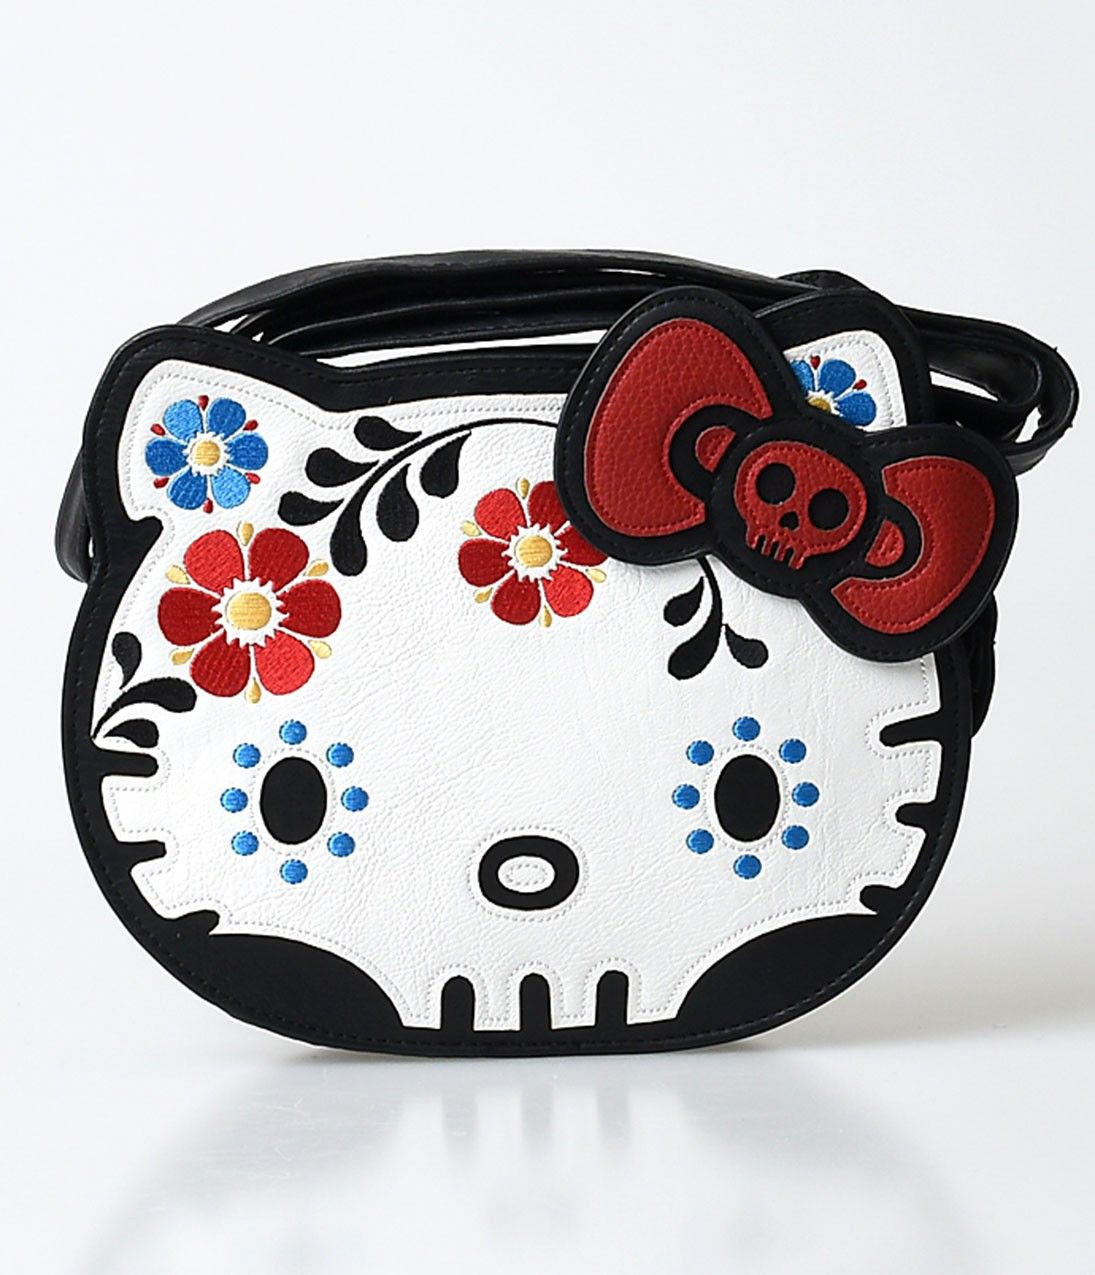 ce7c9a941 Day of the Hello Kitty Crossbody Bag. | Hello Kitty Purse | Hello ...